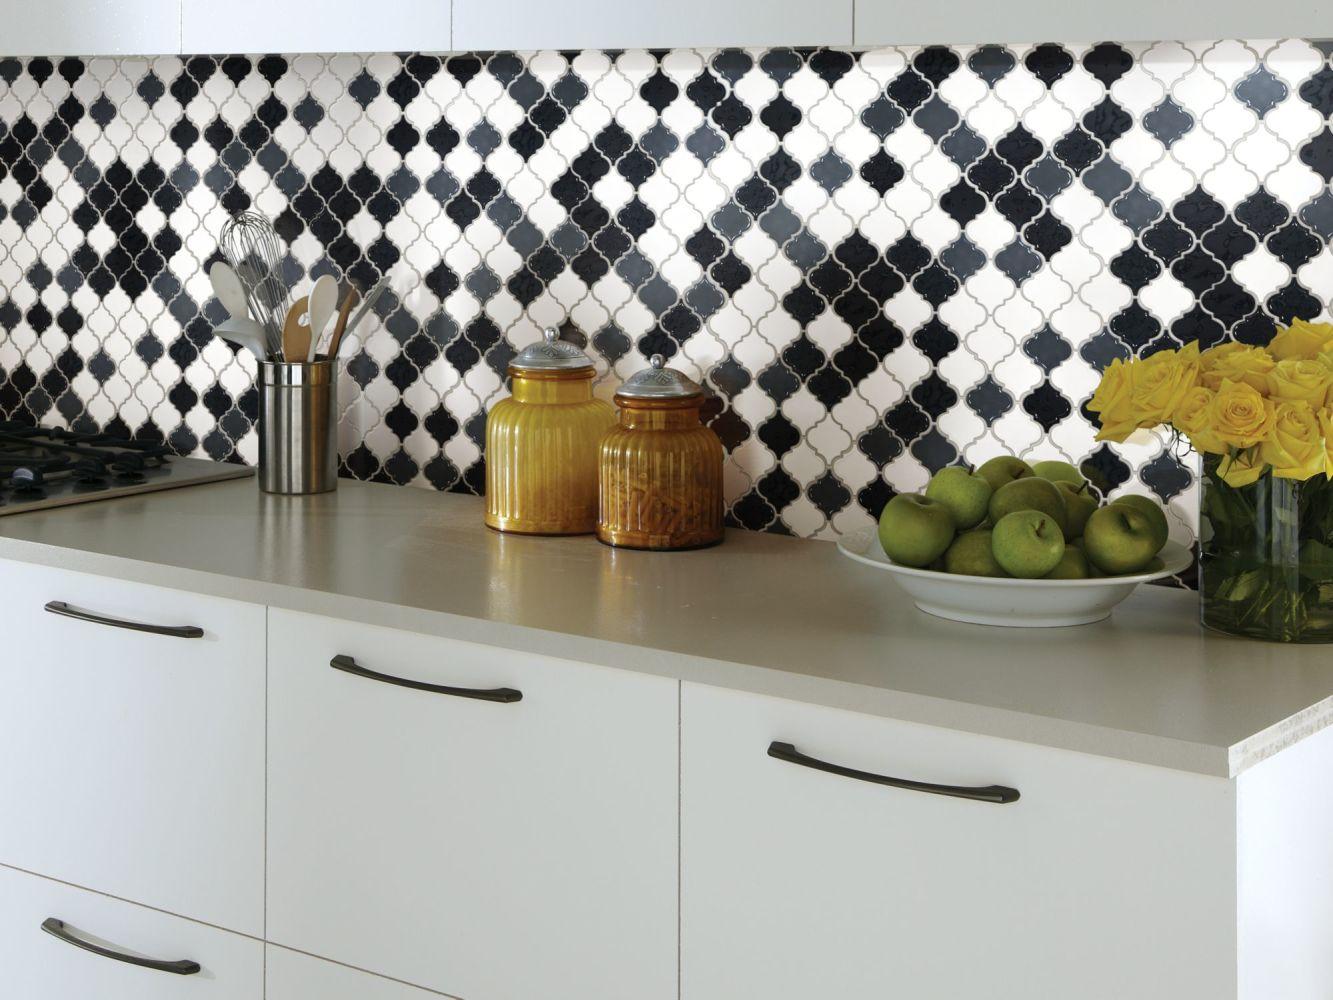 Shaw Floors Home Fn Gold Ceramic Geoscapes Lantern Black/White 00151_TGJ77